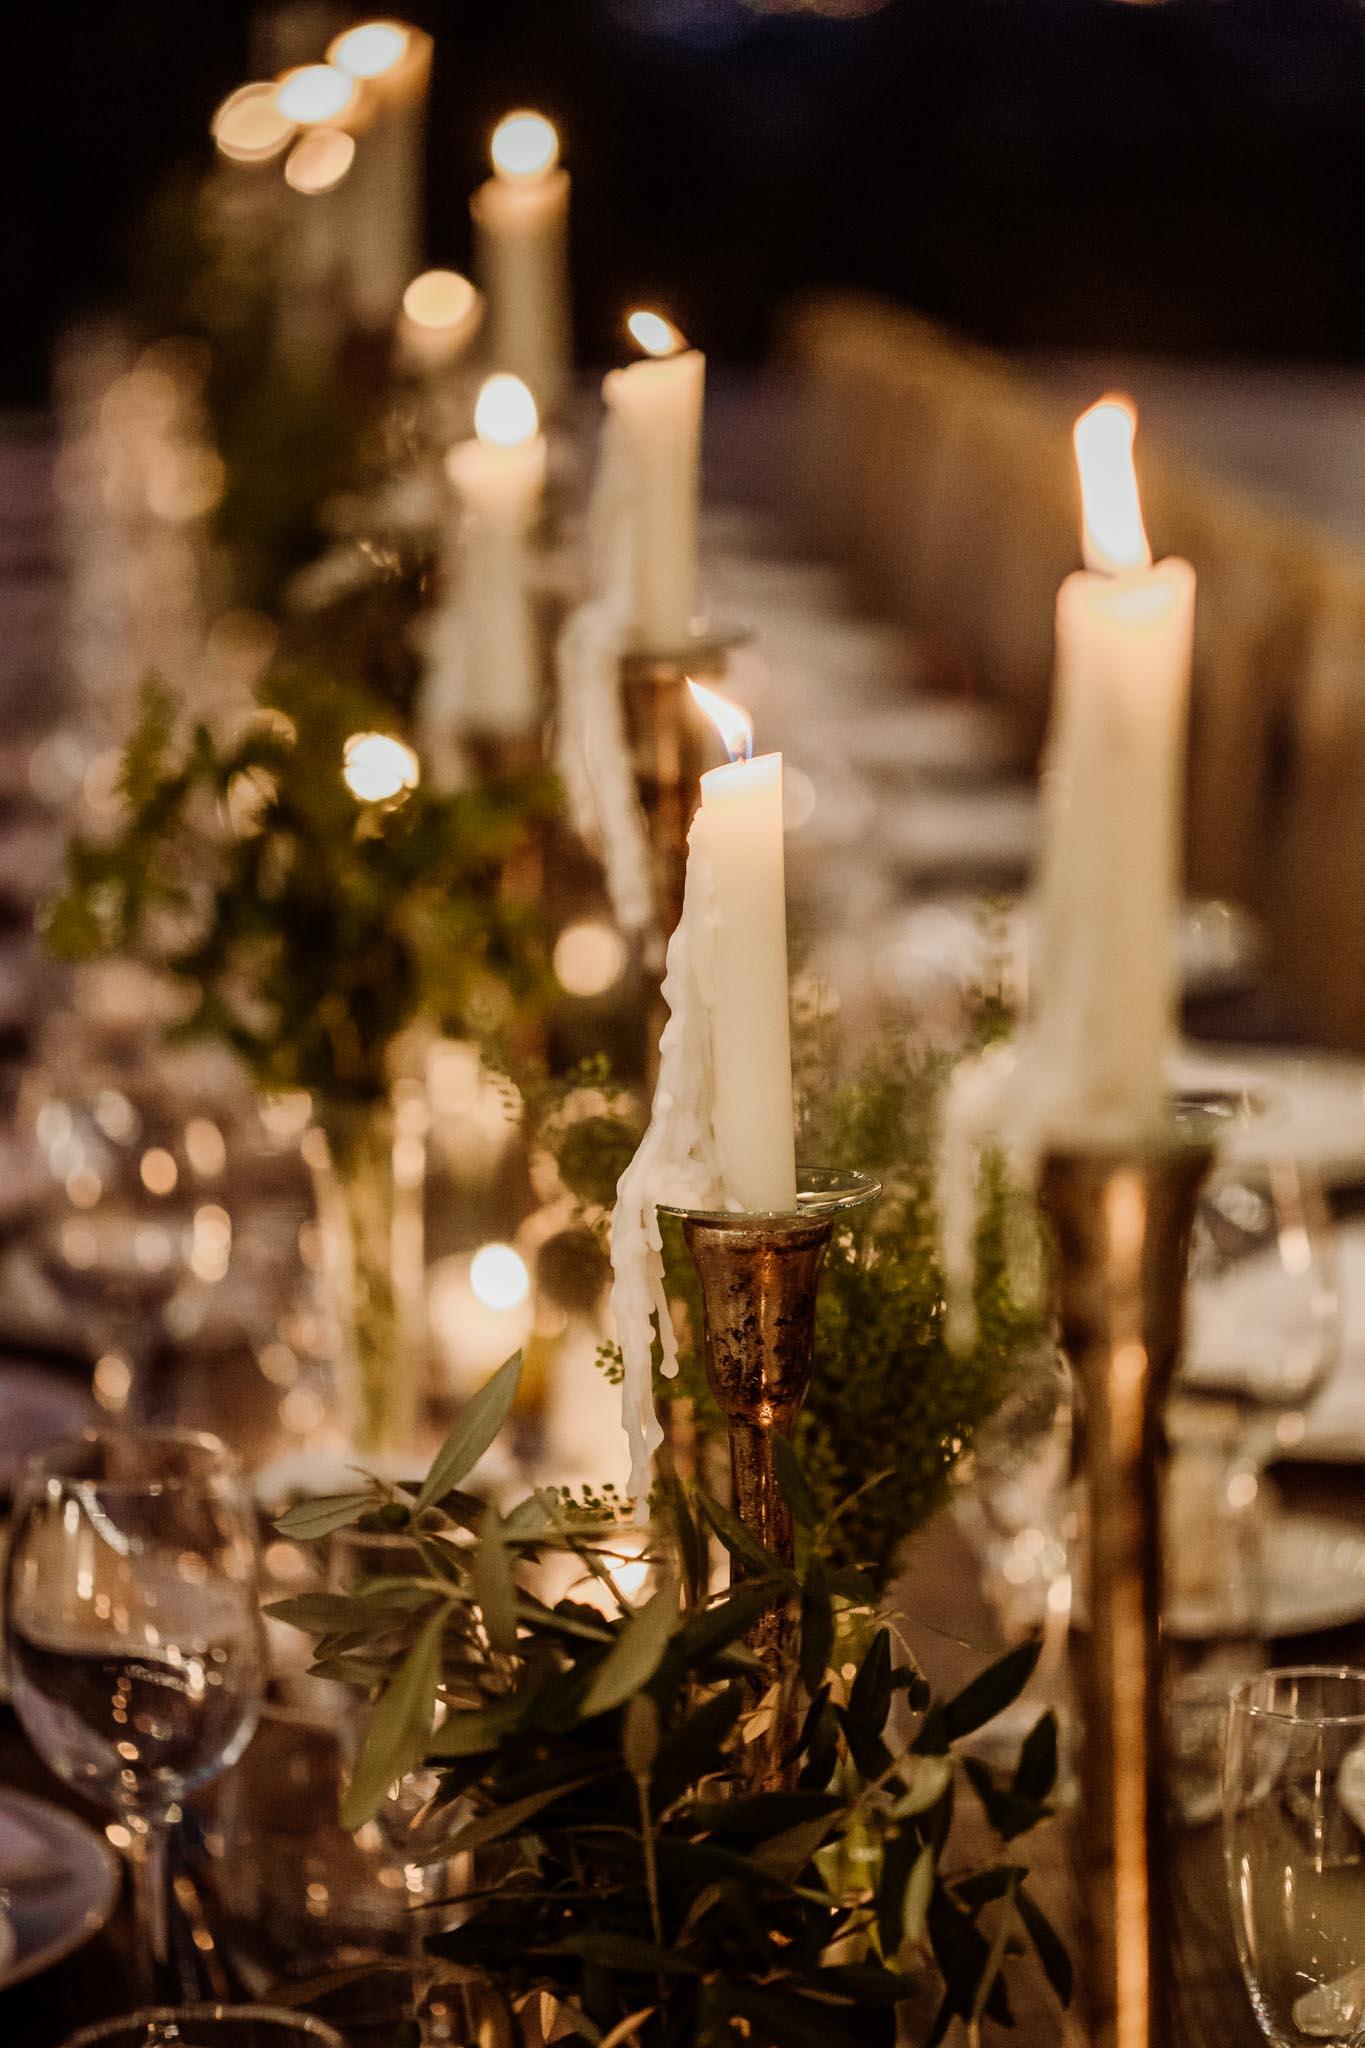 Si-Quiero-Wedding-Planner-By-Sira-Antequera-Bodas-Málaga-Marbella-Miami- Ana-Aitor-5